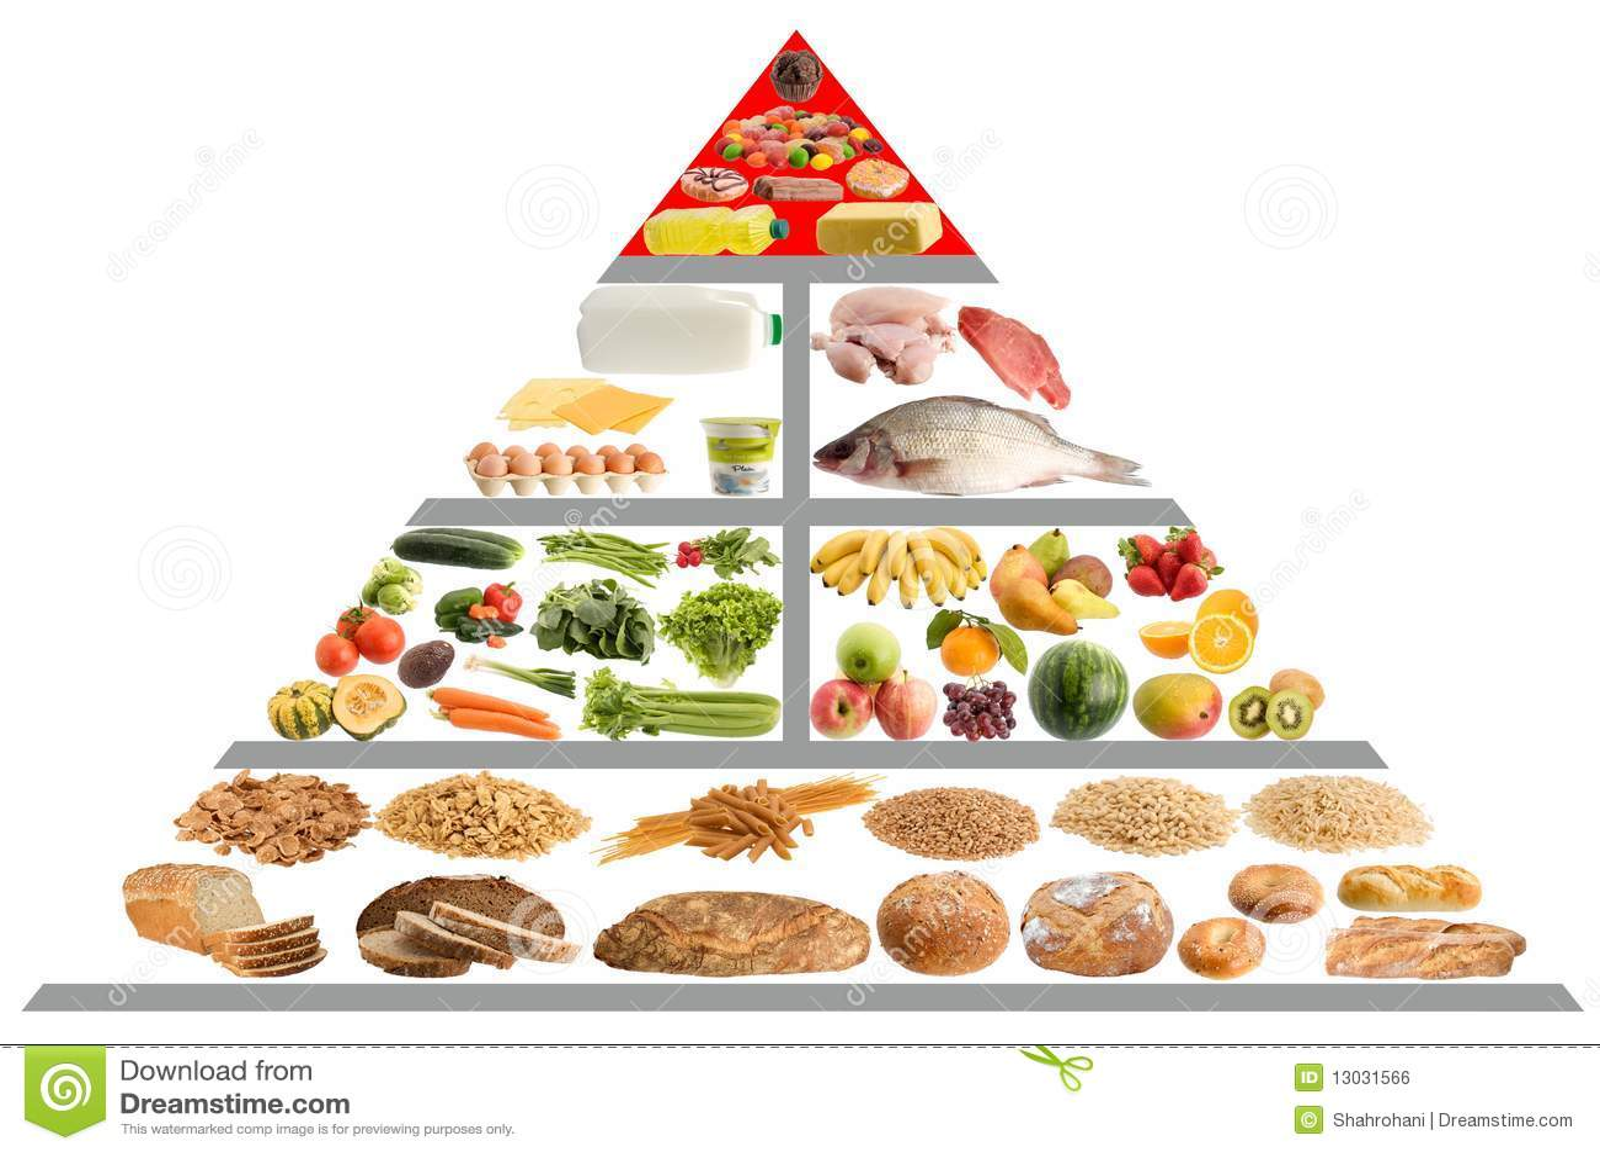 Food Pyramid Guide Stock Photo Image Of Pyramid Grain